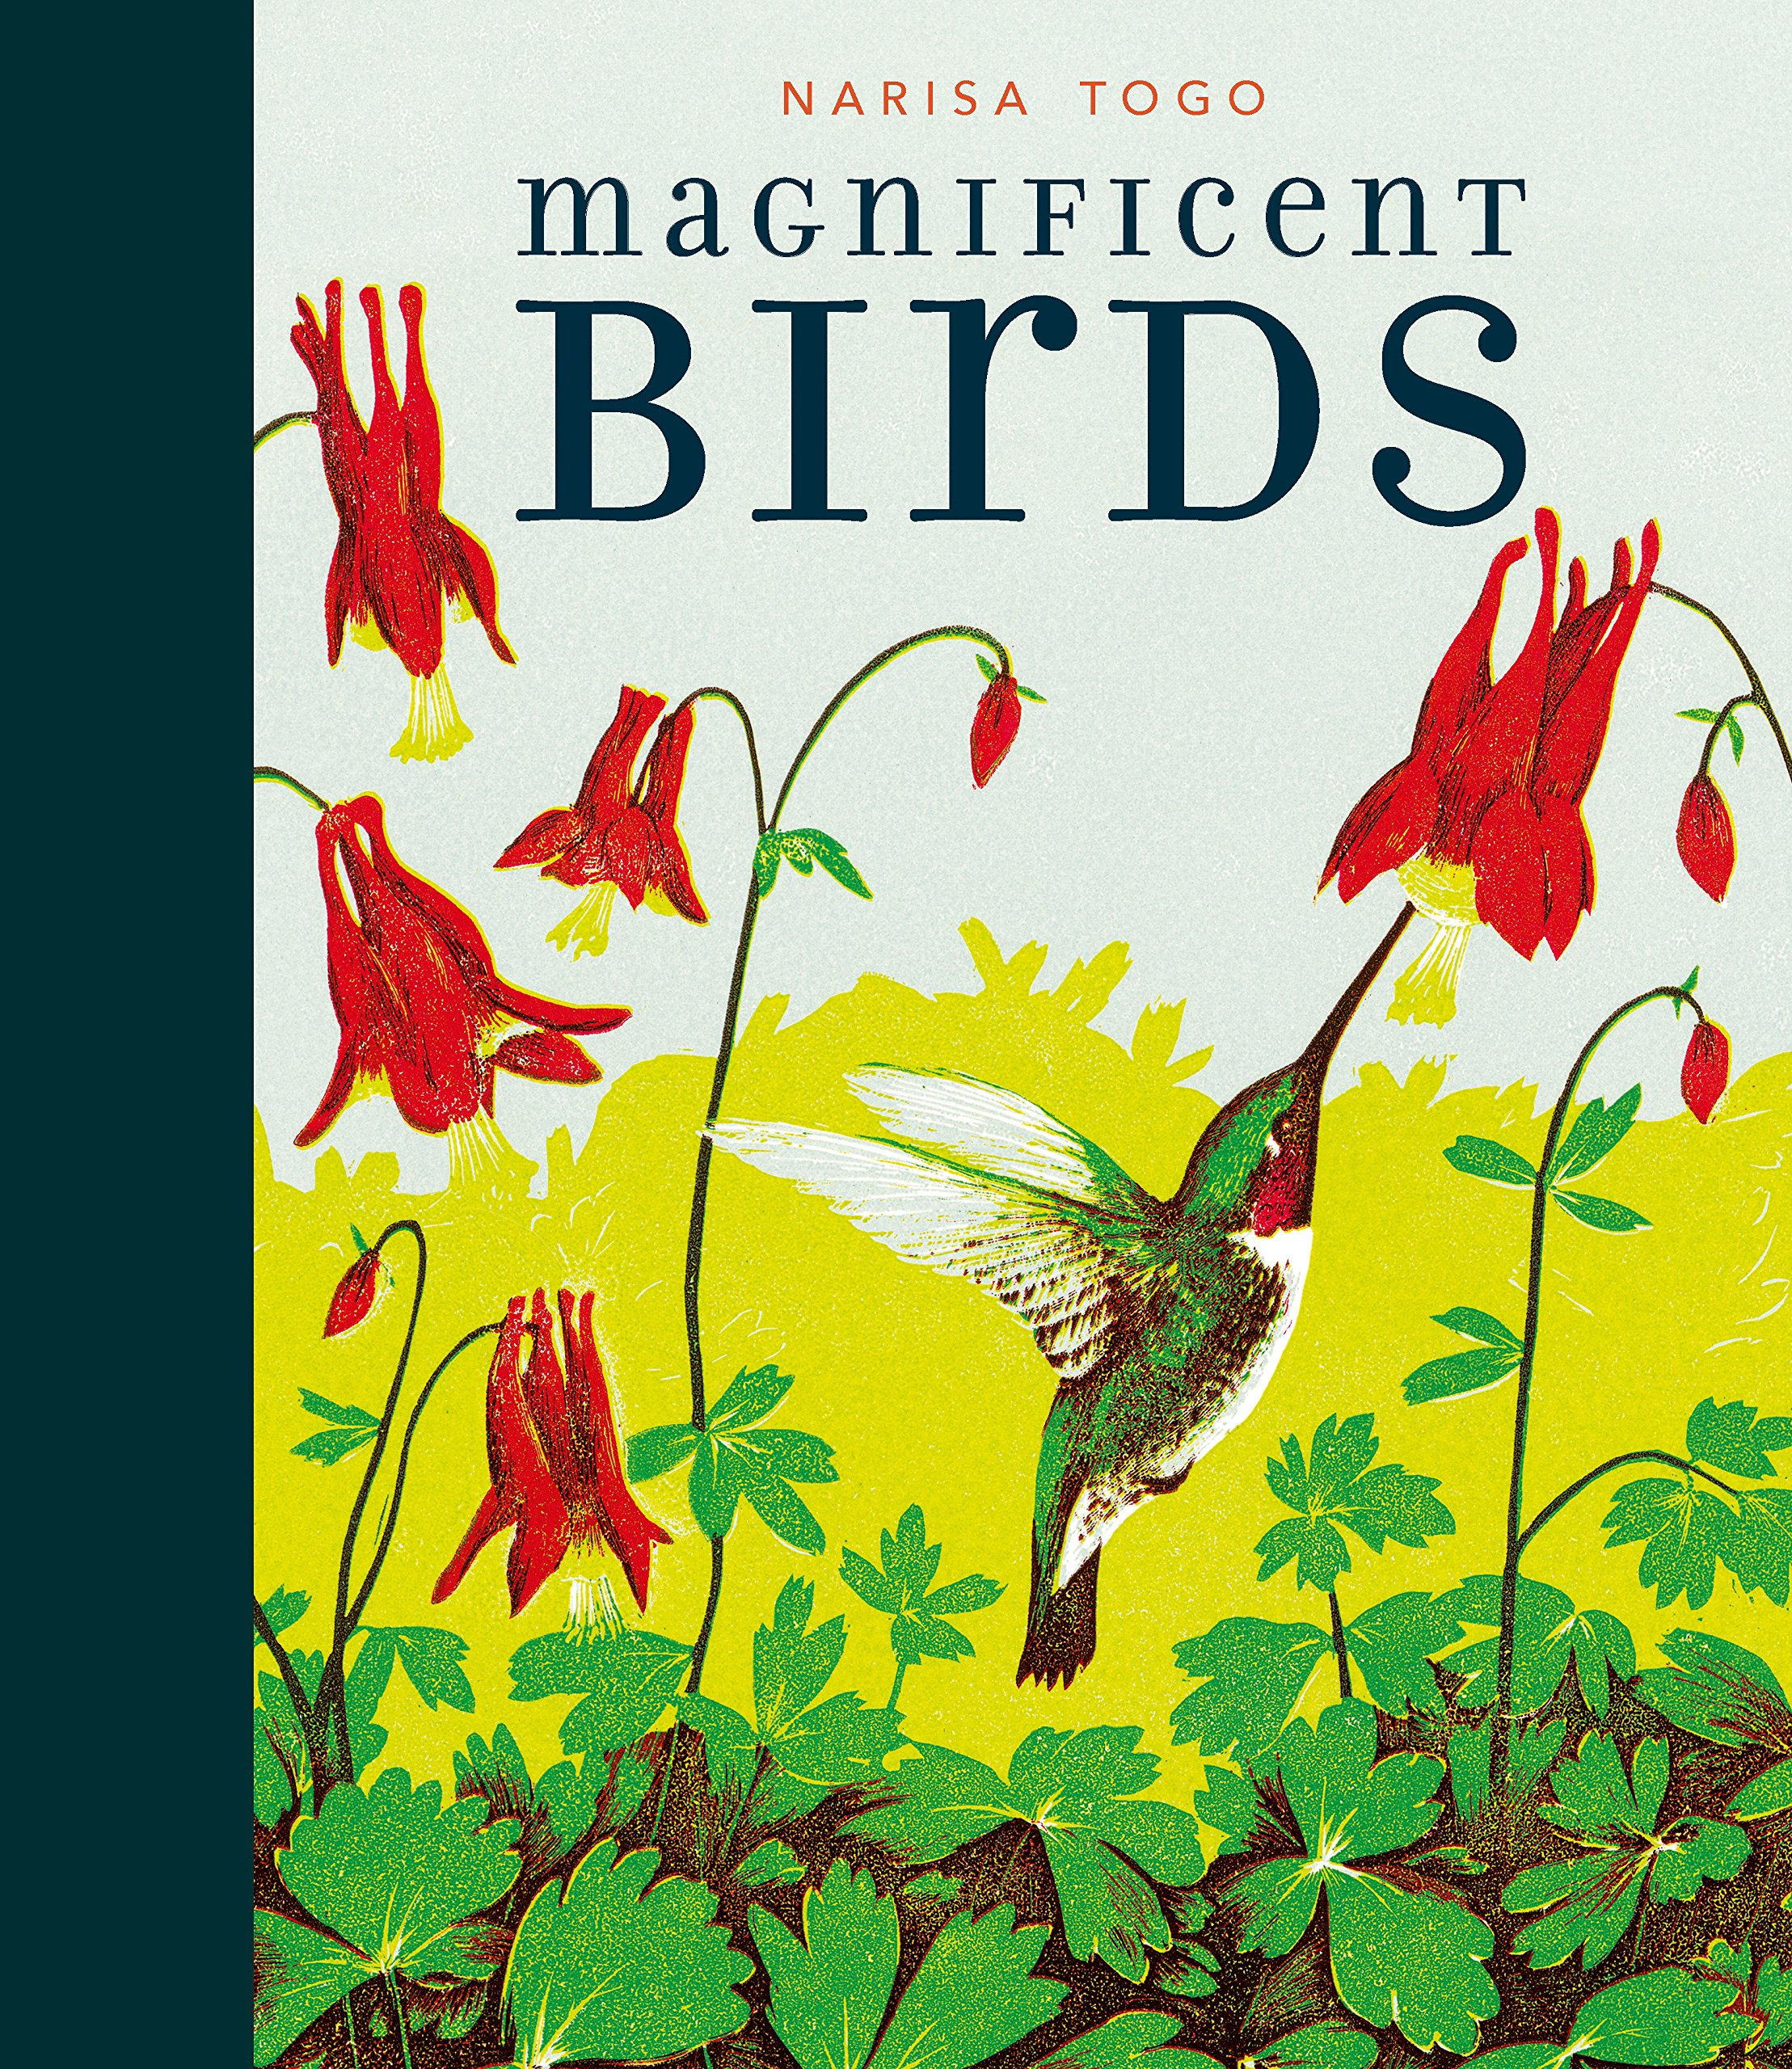 Magnificent Birds Candlewick Press